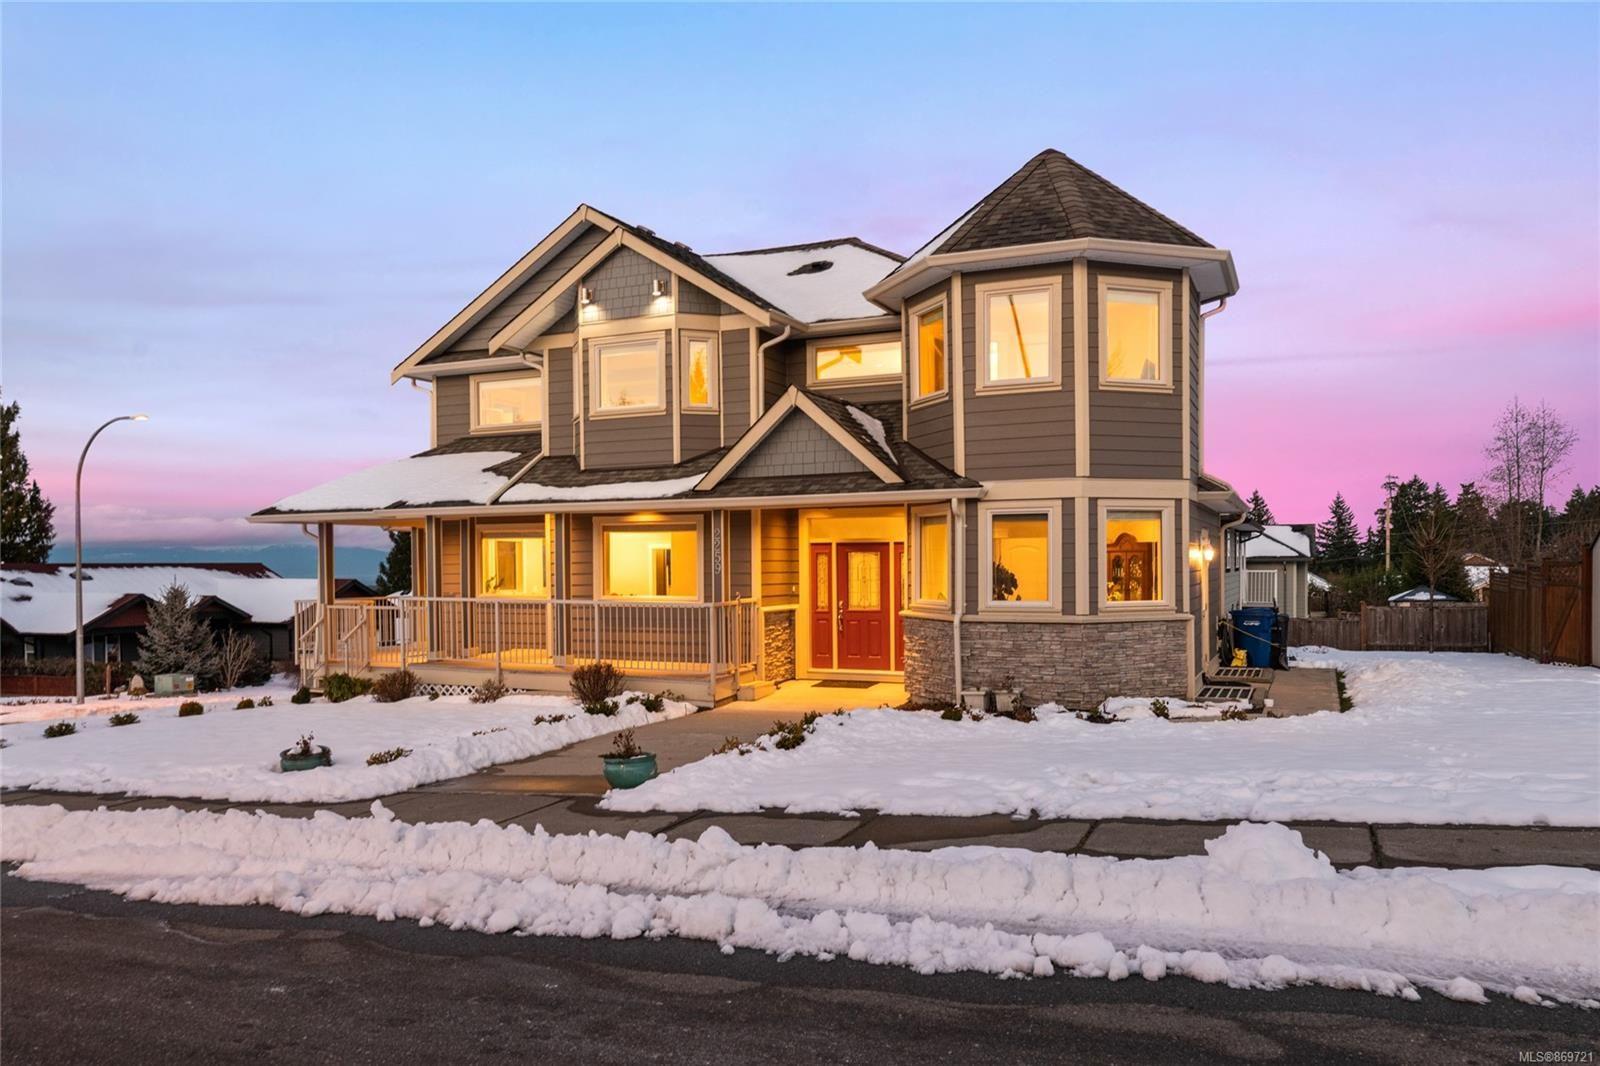 Photo 24: Photos: 2259 Leighton Rd in : Na South Jingle Pot House for sale (Nanaimo)  : MLS®# 869721